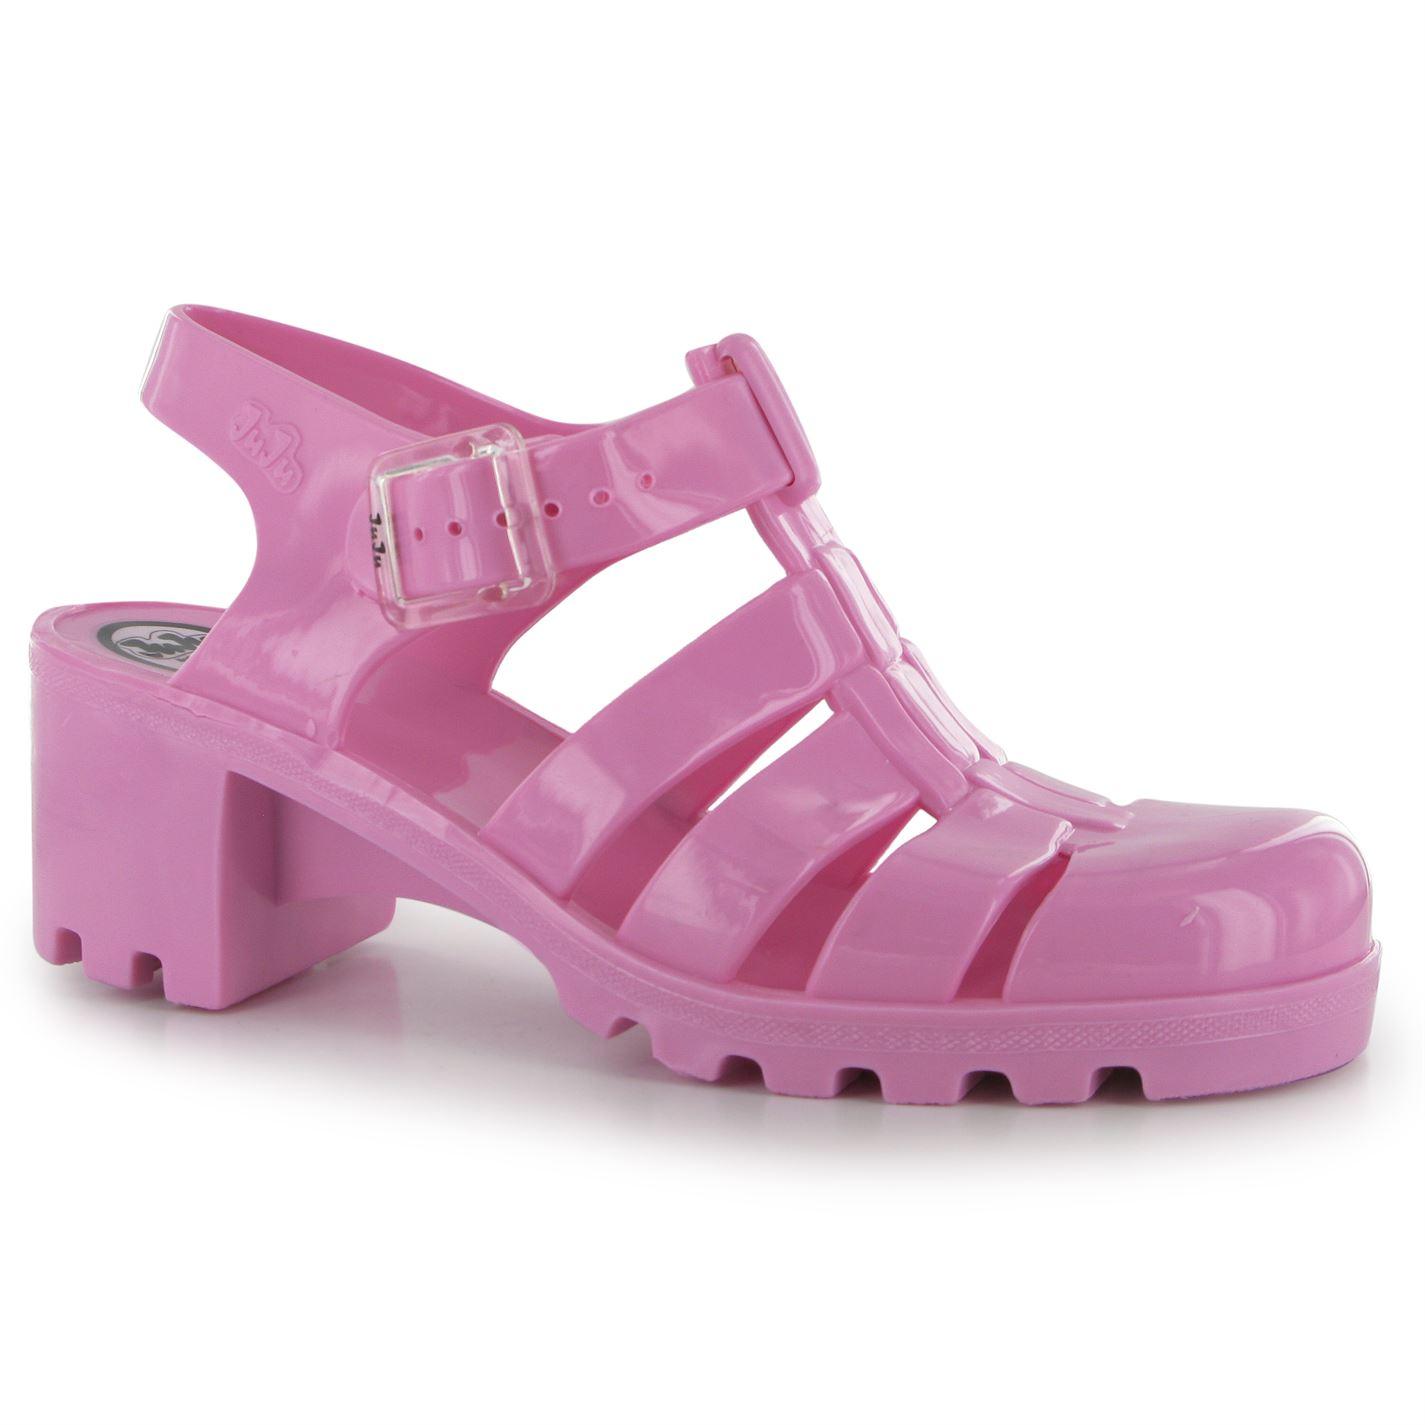 Sandale JuJu Jellies Babe